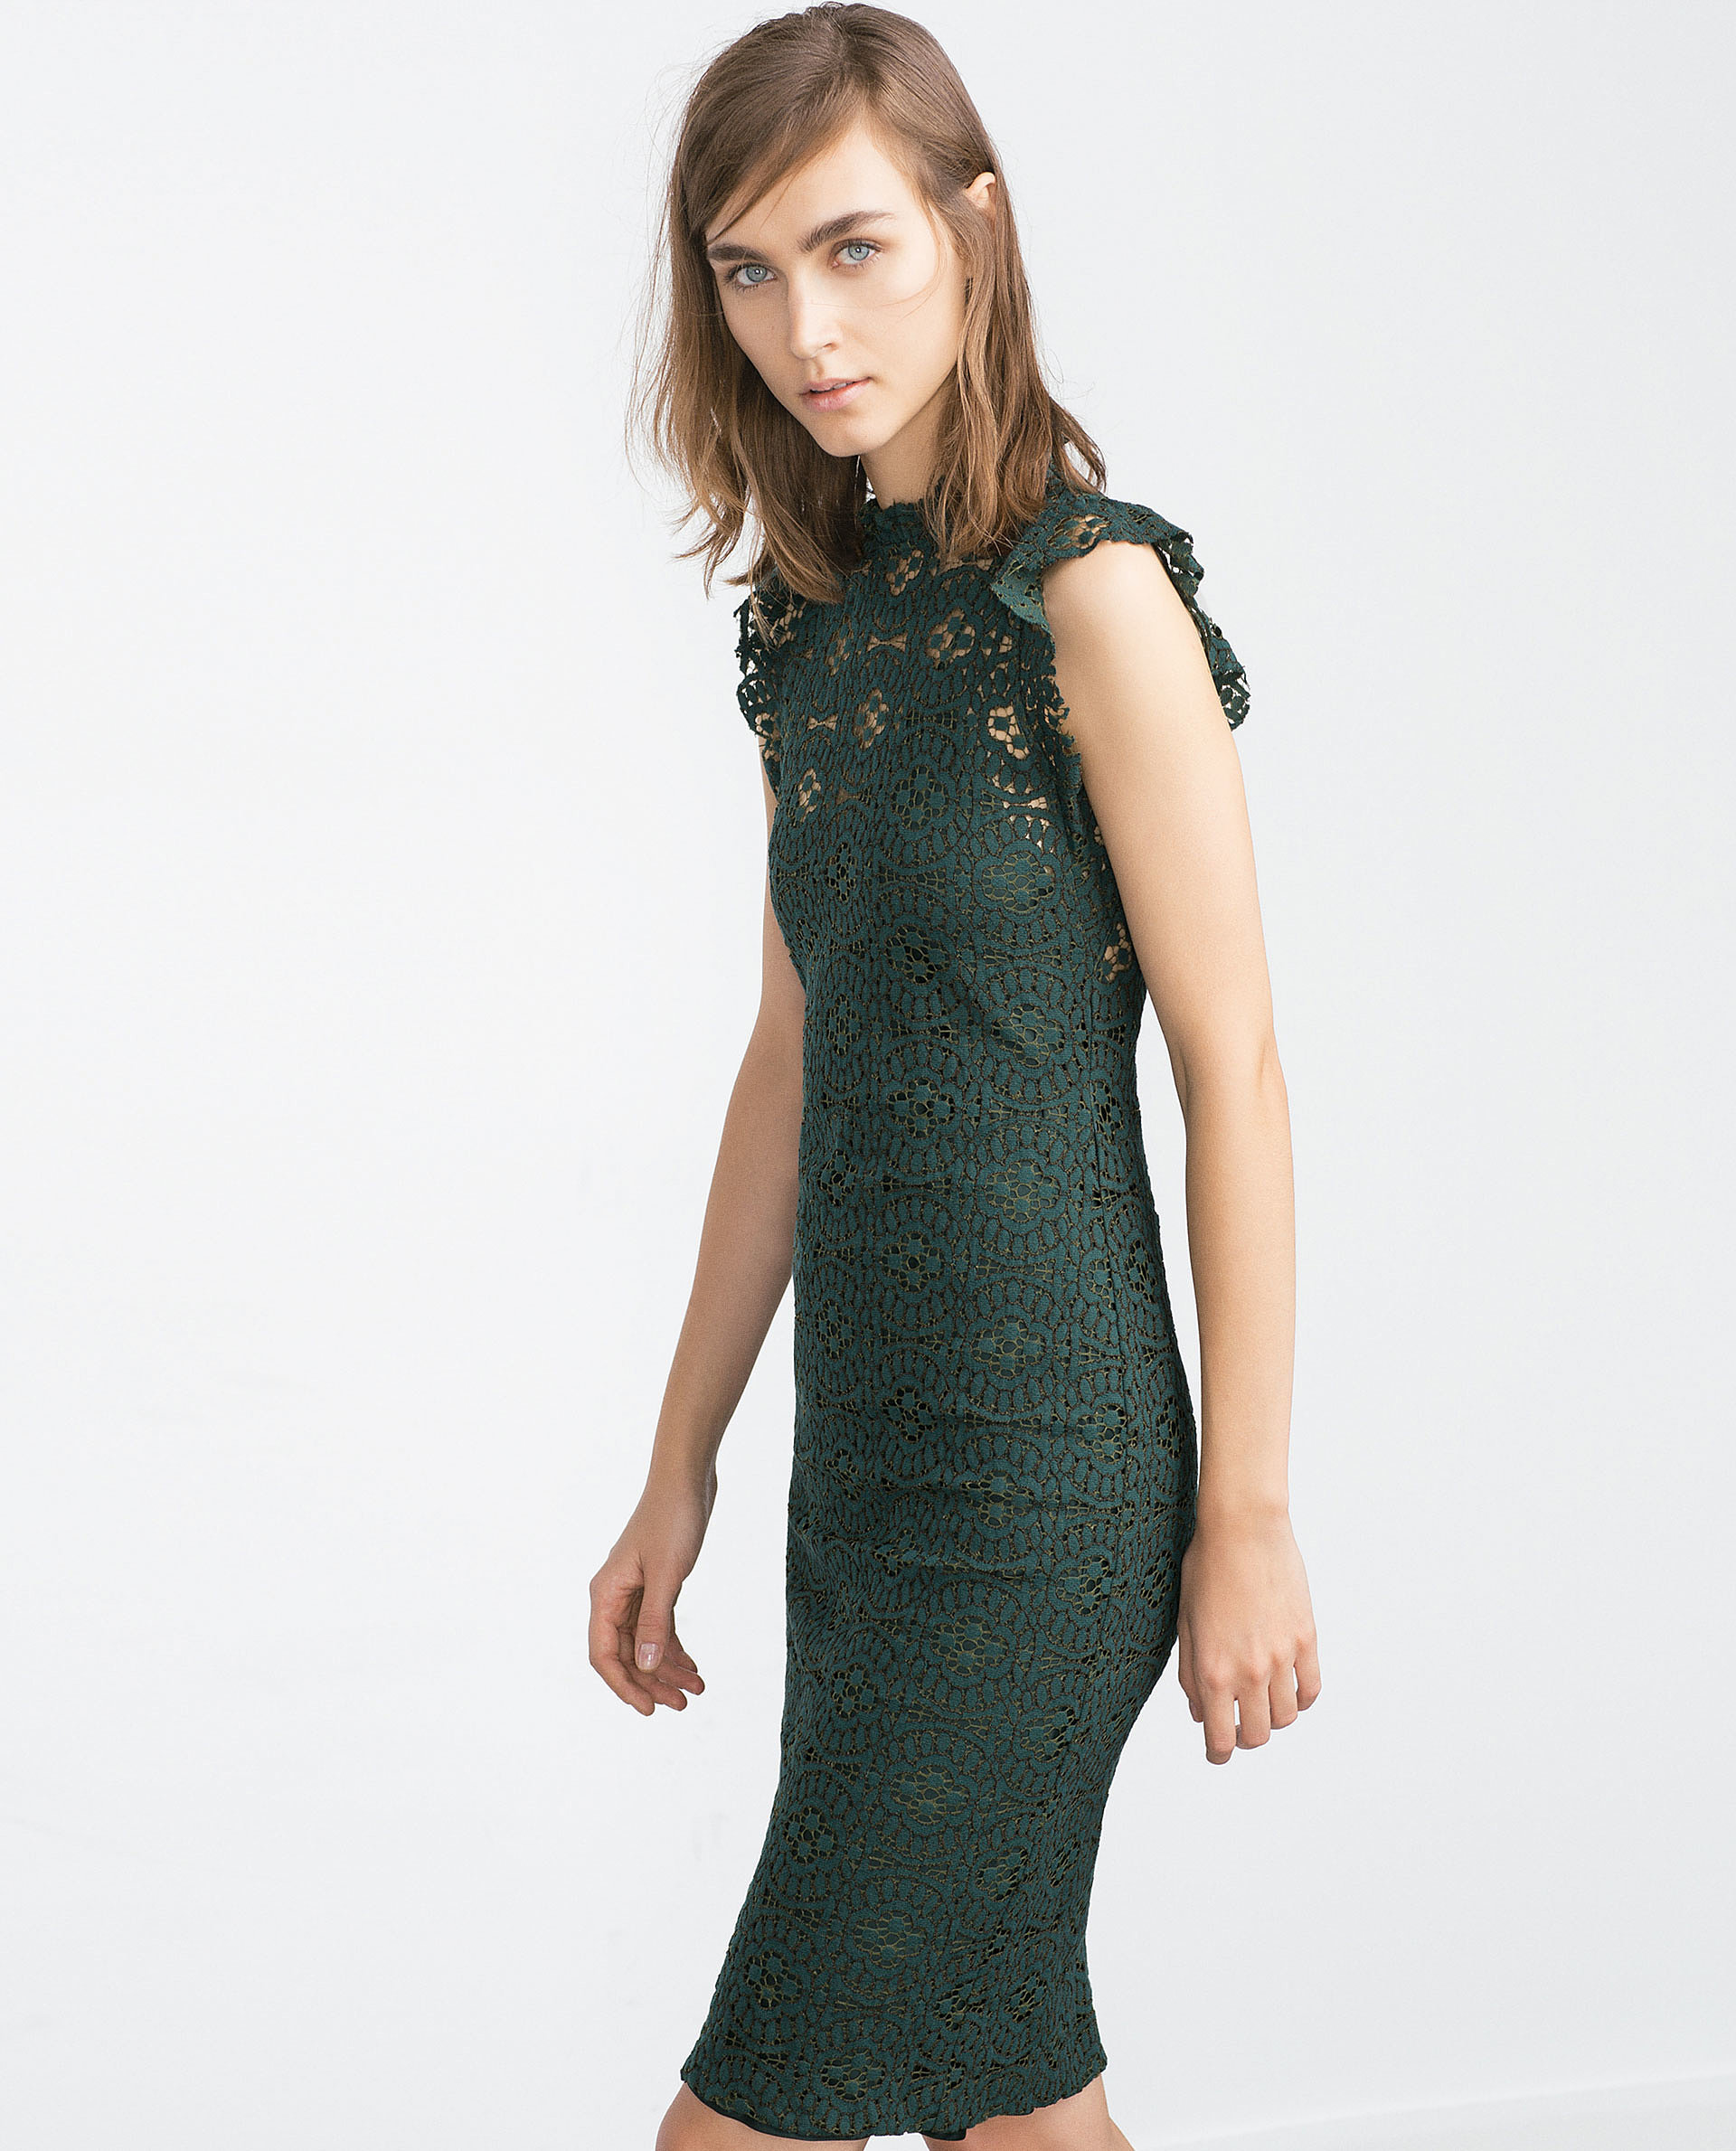 Zara Party Dresses 24